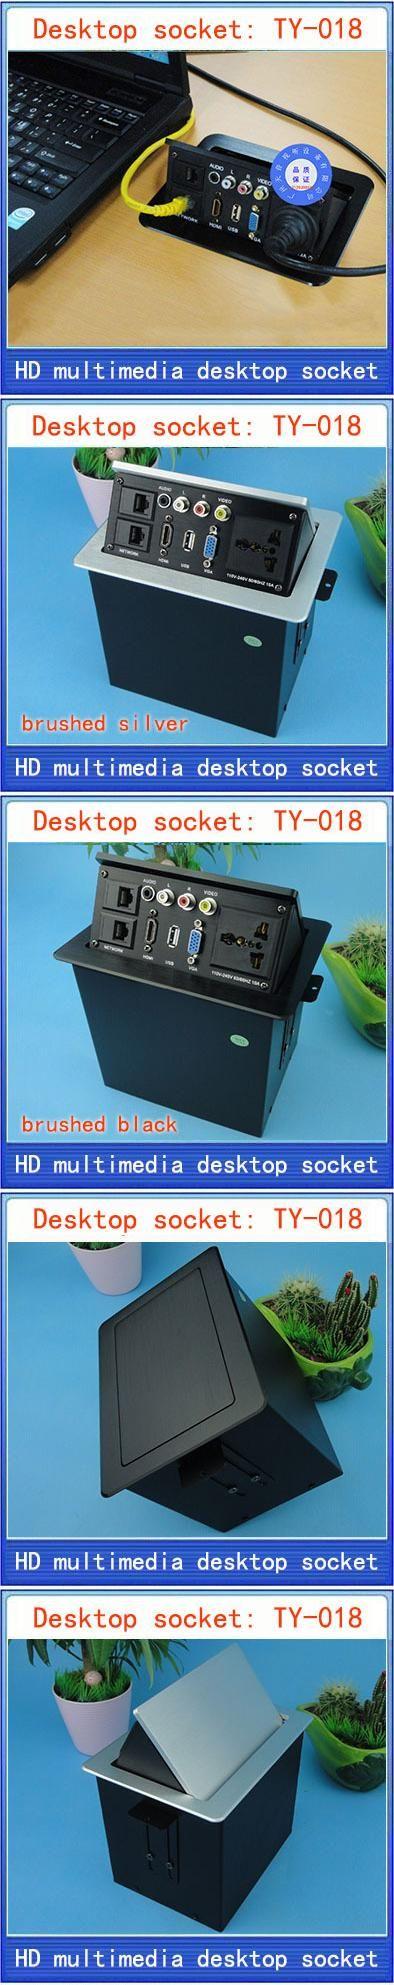 Desktop socket / new / hidden multimedia information box outlet / HD HDMI network RJ45 video Audio USB VGA desktop socket TY-018